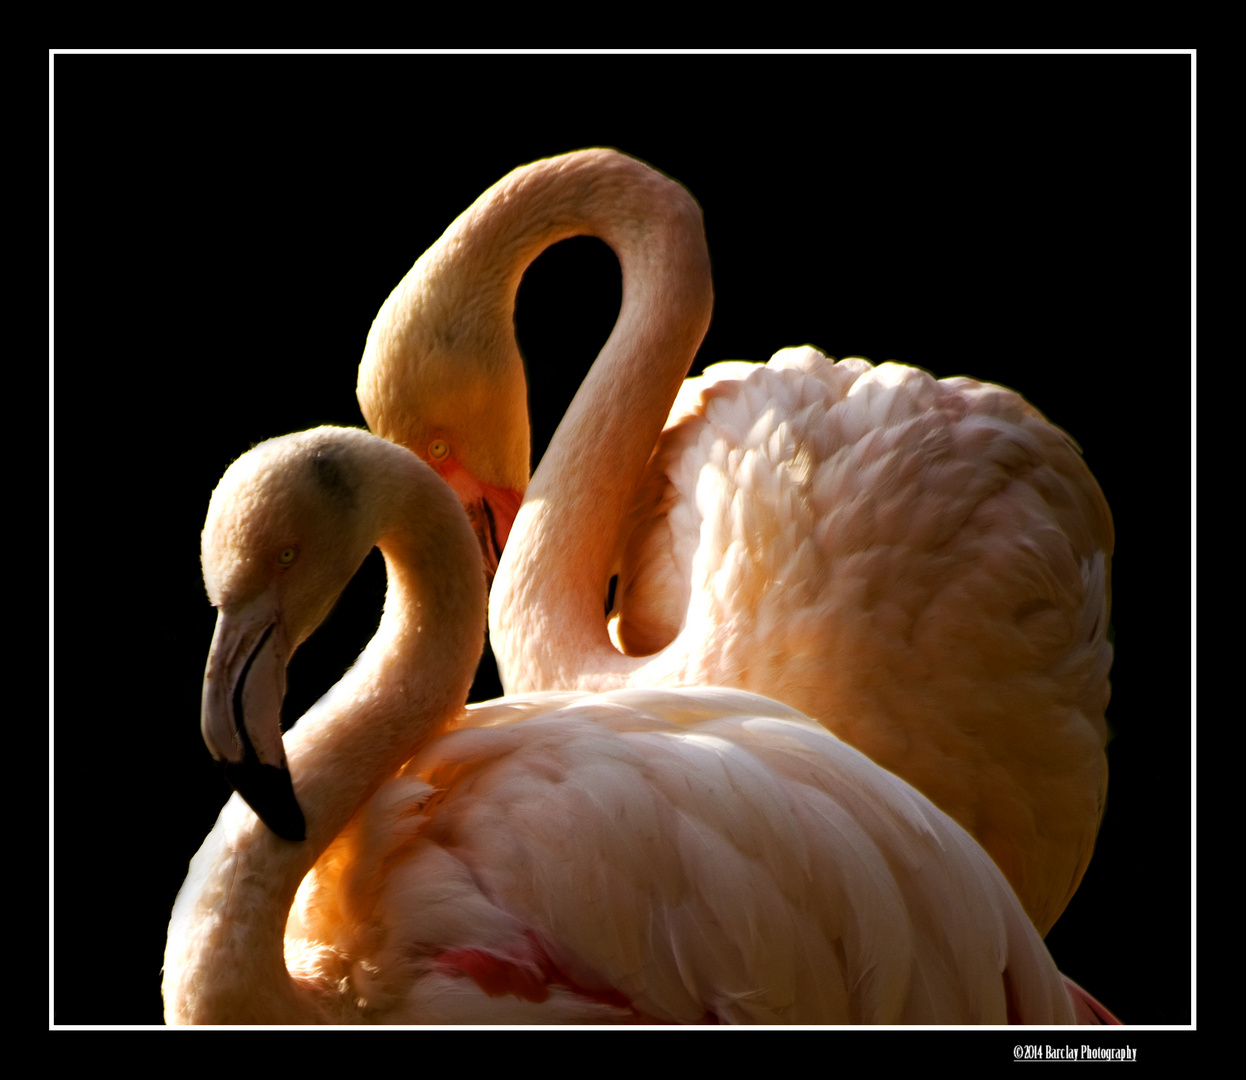 Dance of the Flamingo,s